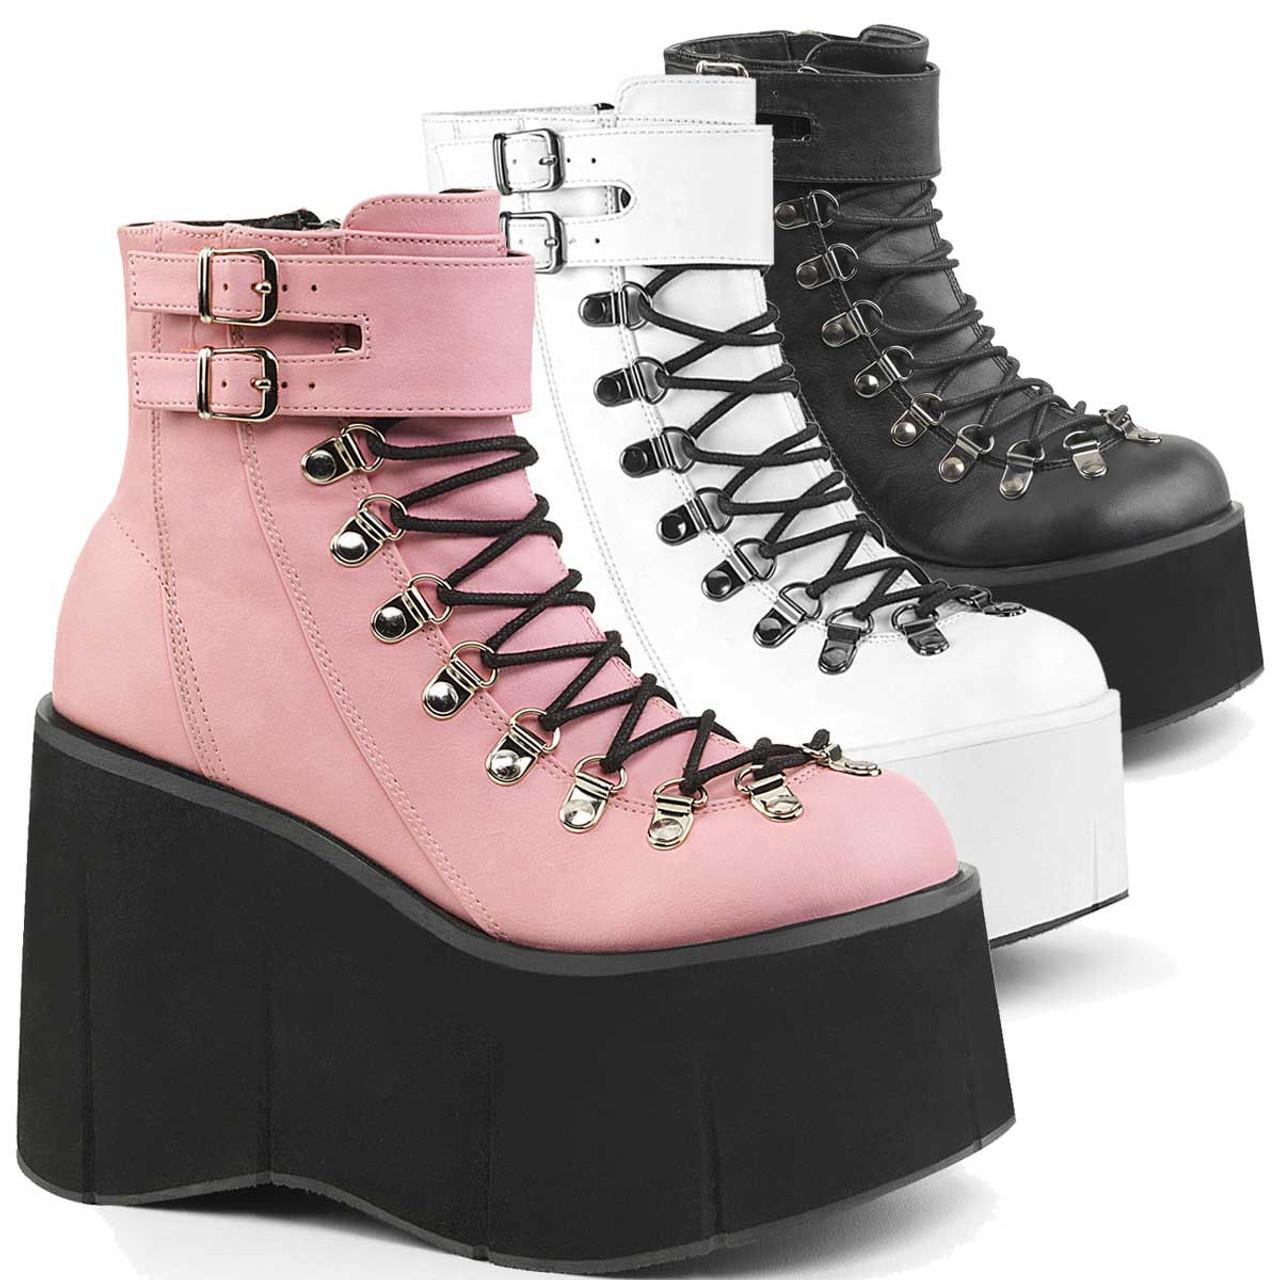 Pleaser Demonia Shaker 52 Black Vegan Leather Lace Up Wedge Platform Ankle Boots